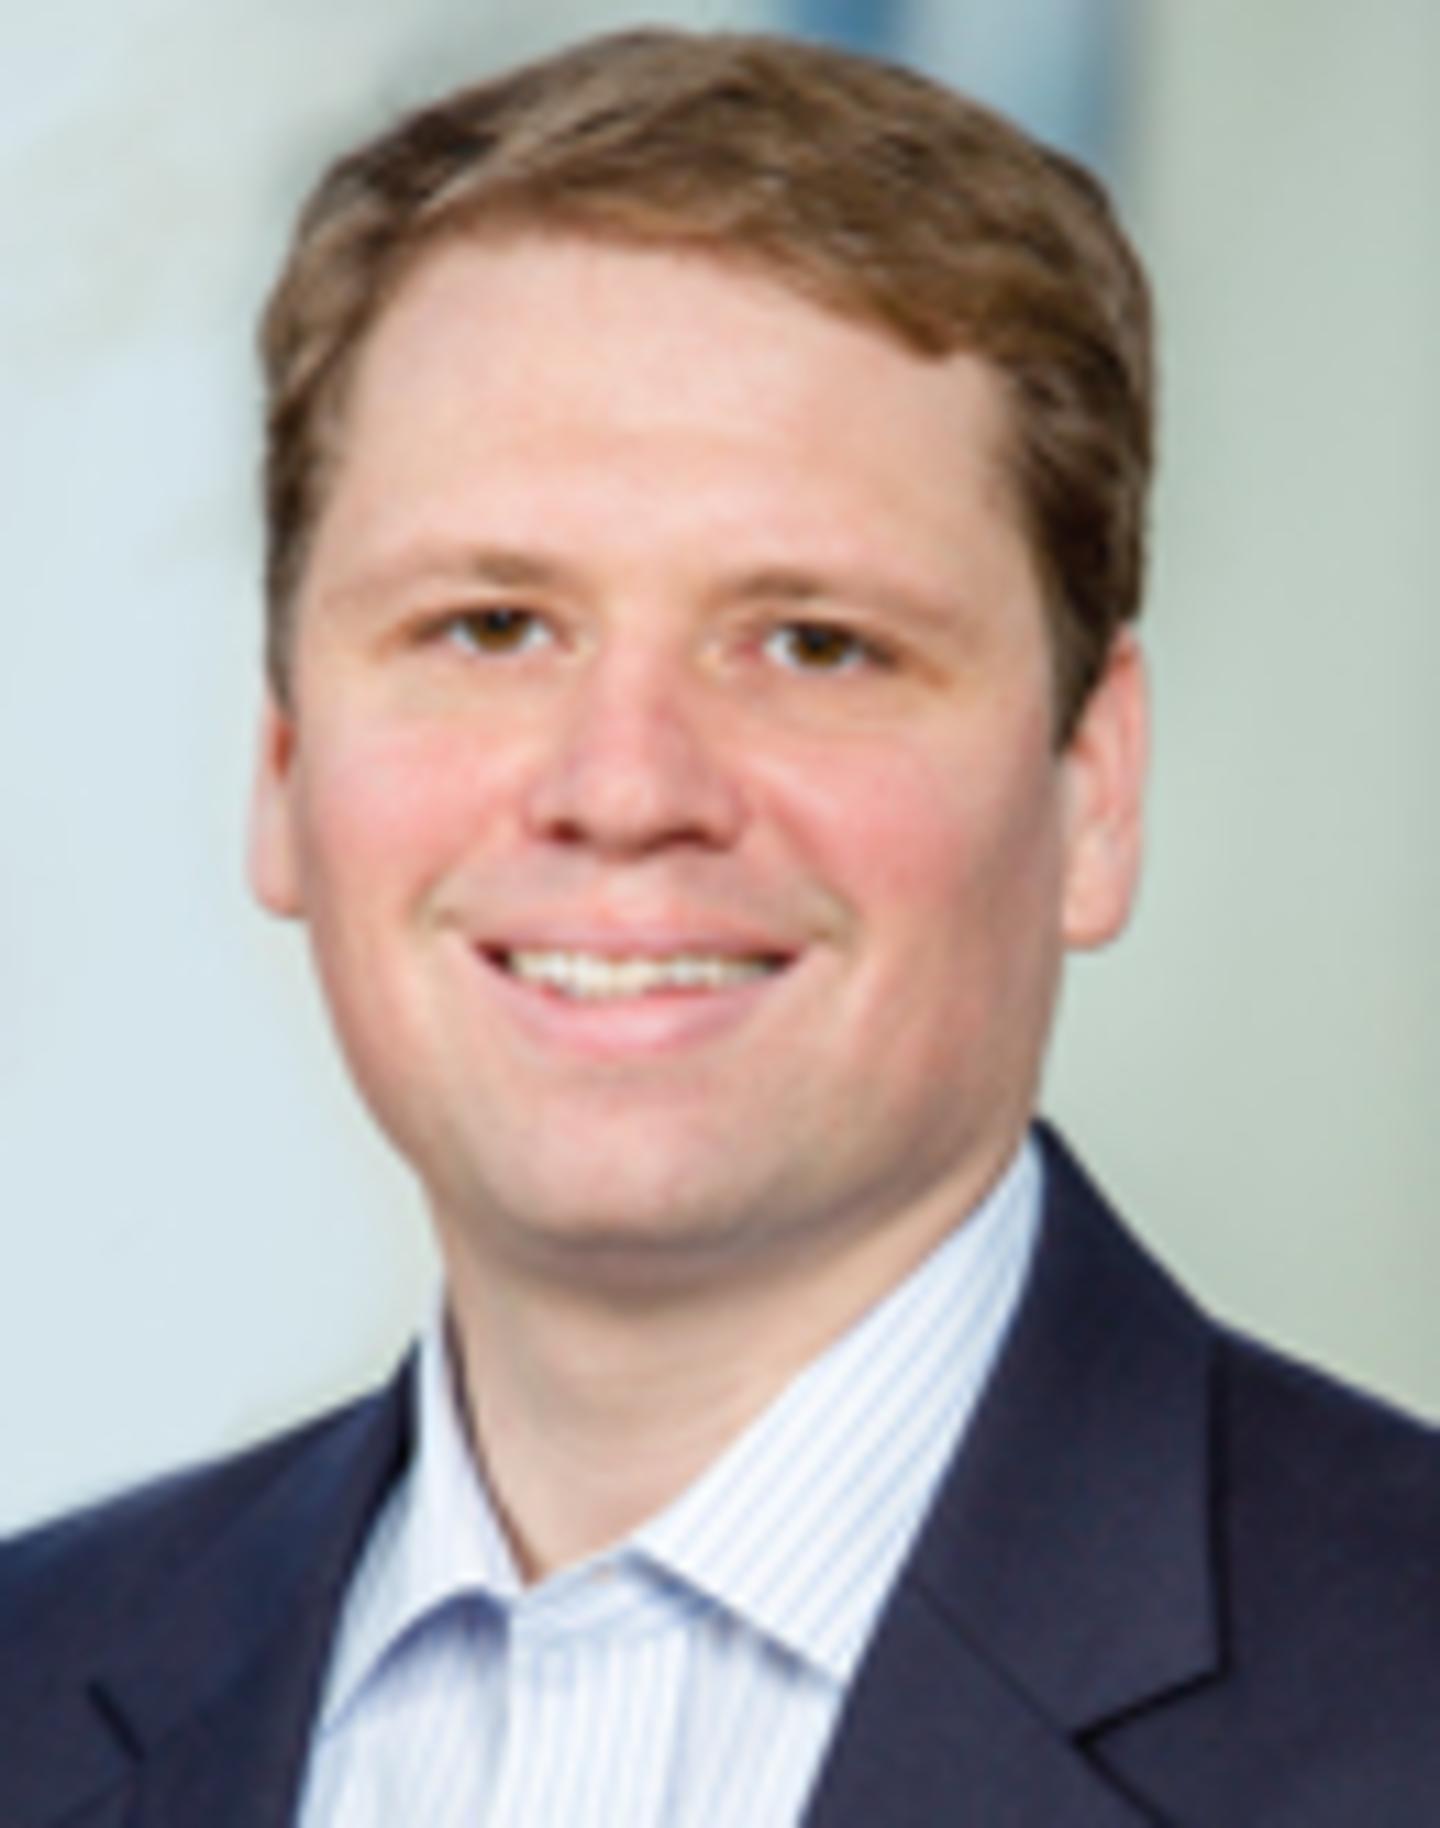 Jon Porter